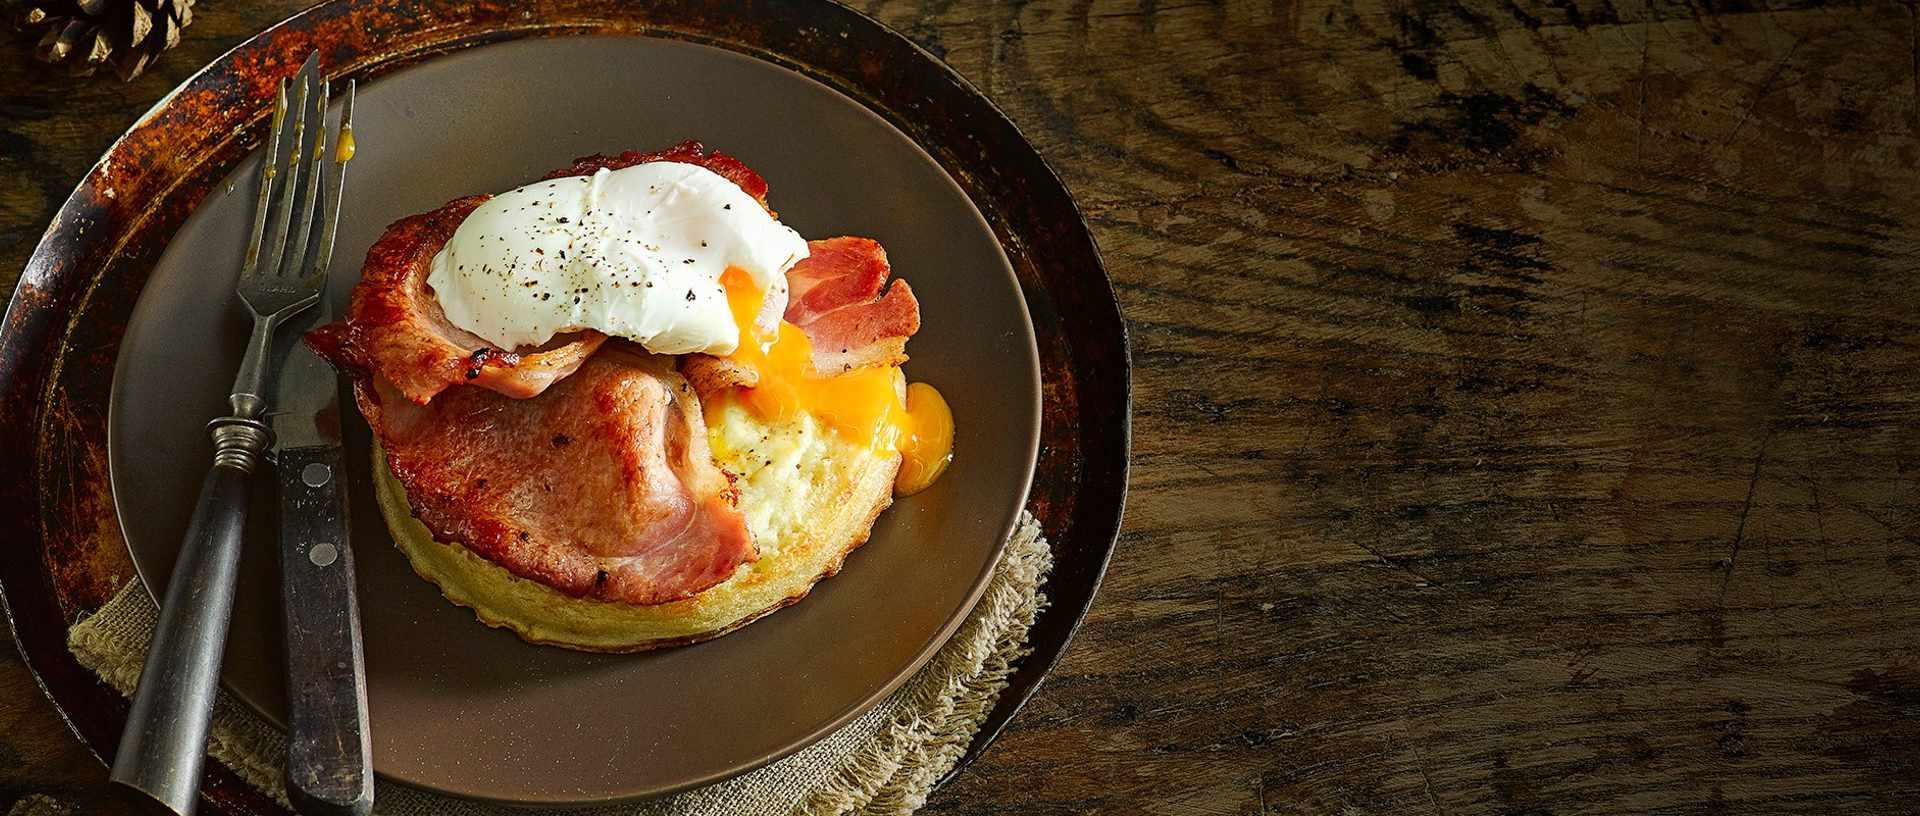 bacon egg crumpets